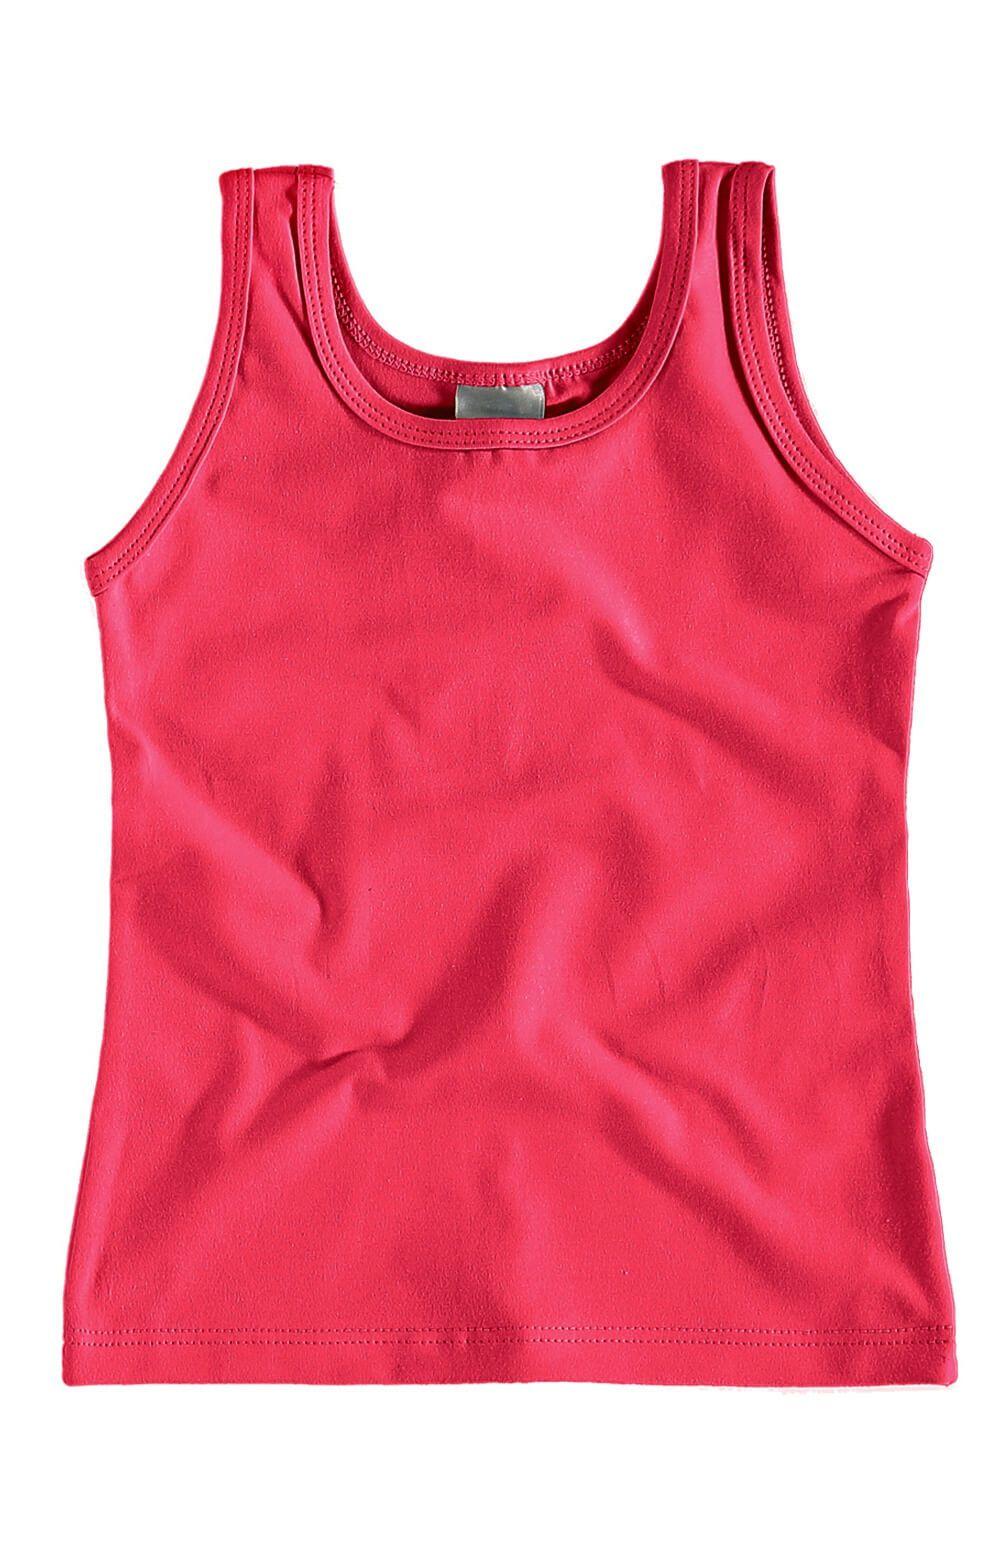 Blusa Infantil Regata Vermelha Feminina Malwee